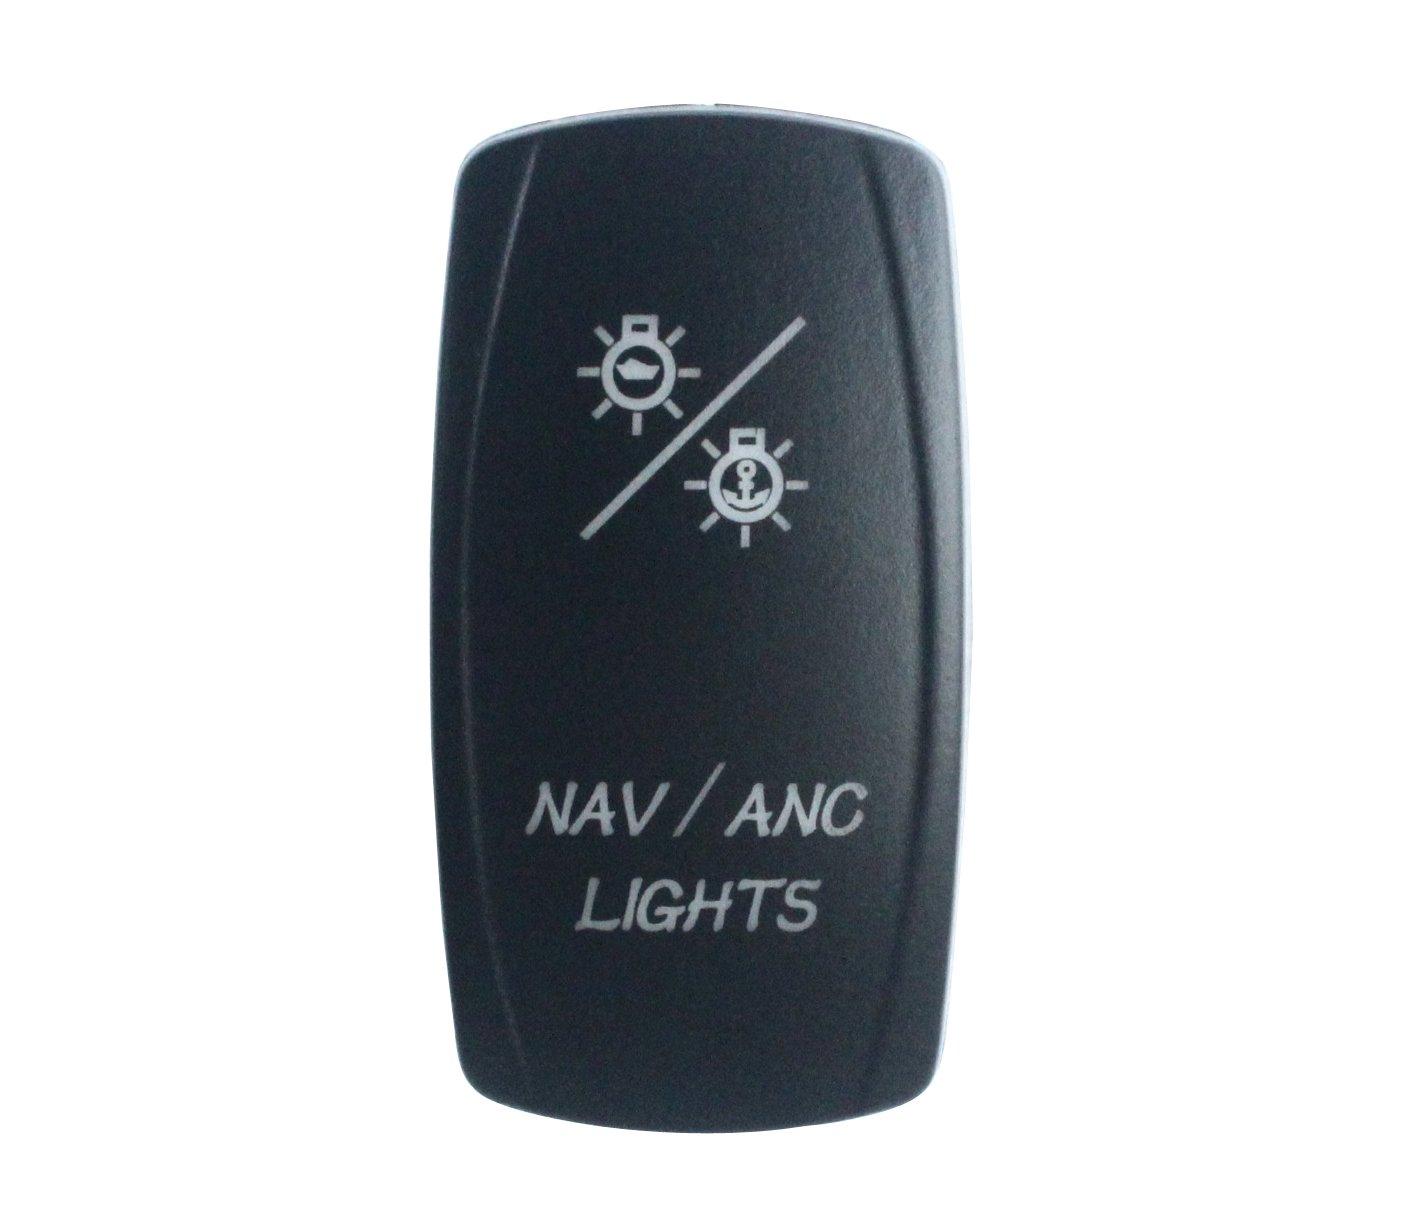 BANDC NAV/ANC LIGHTS Rocker Switch On-off-ON Blue LED Dpdt/7 pins 12v/24v on